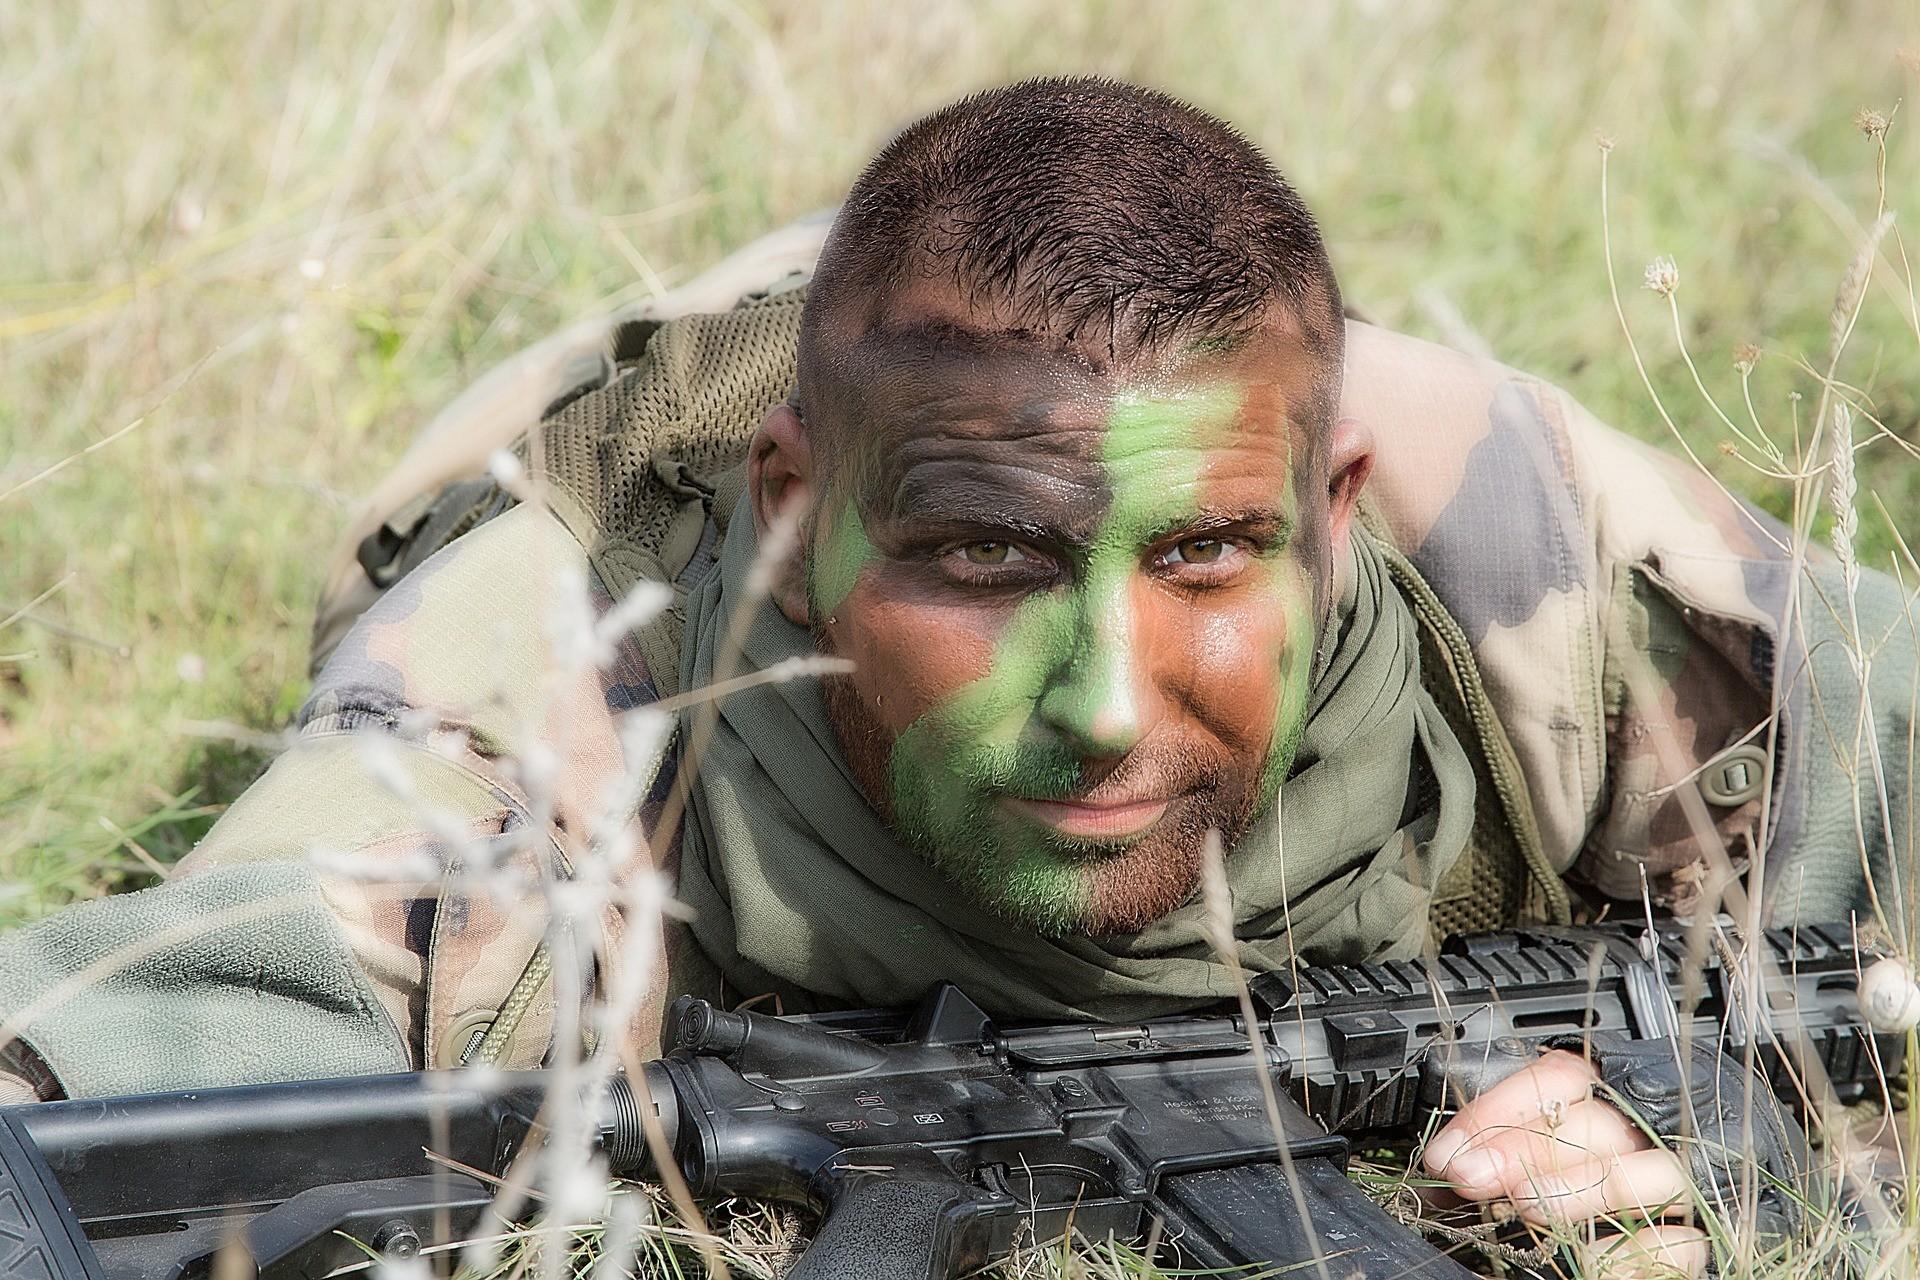 military-1442907_1920